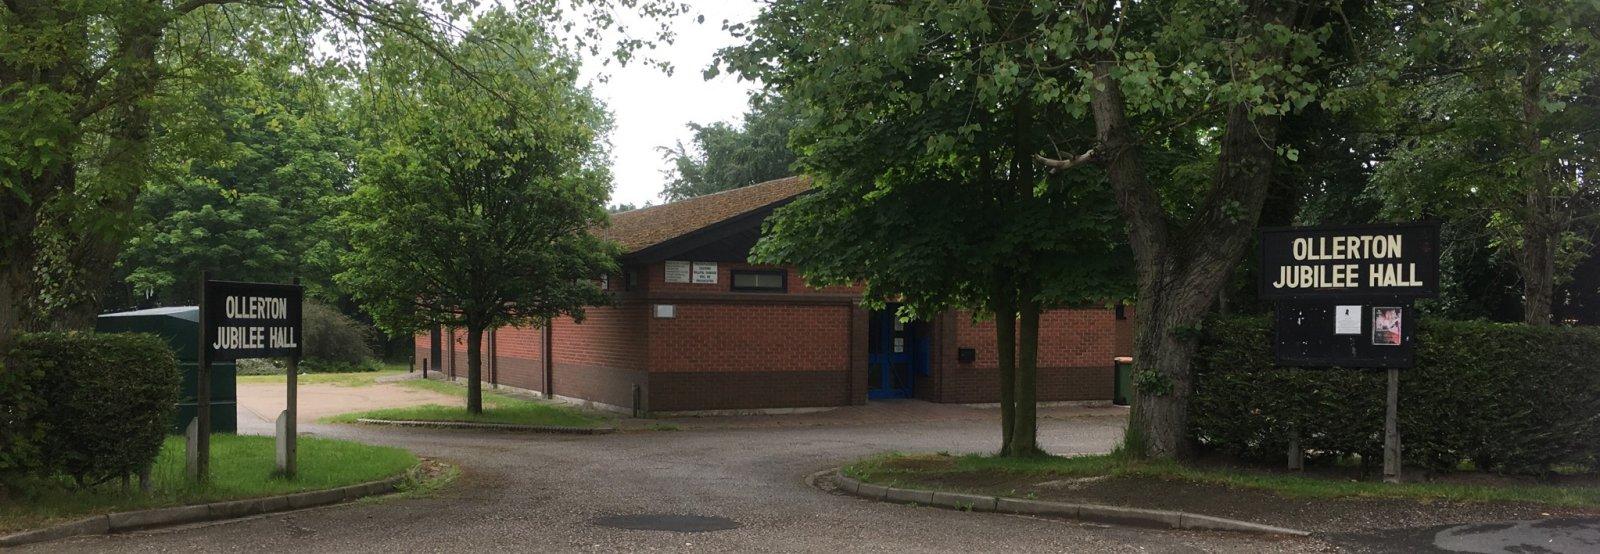 Ollerton Jubilee Hall